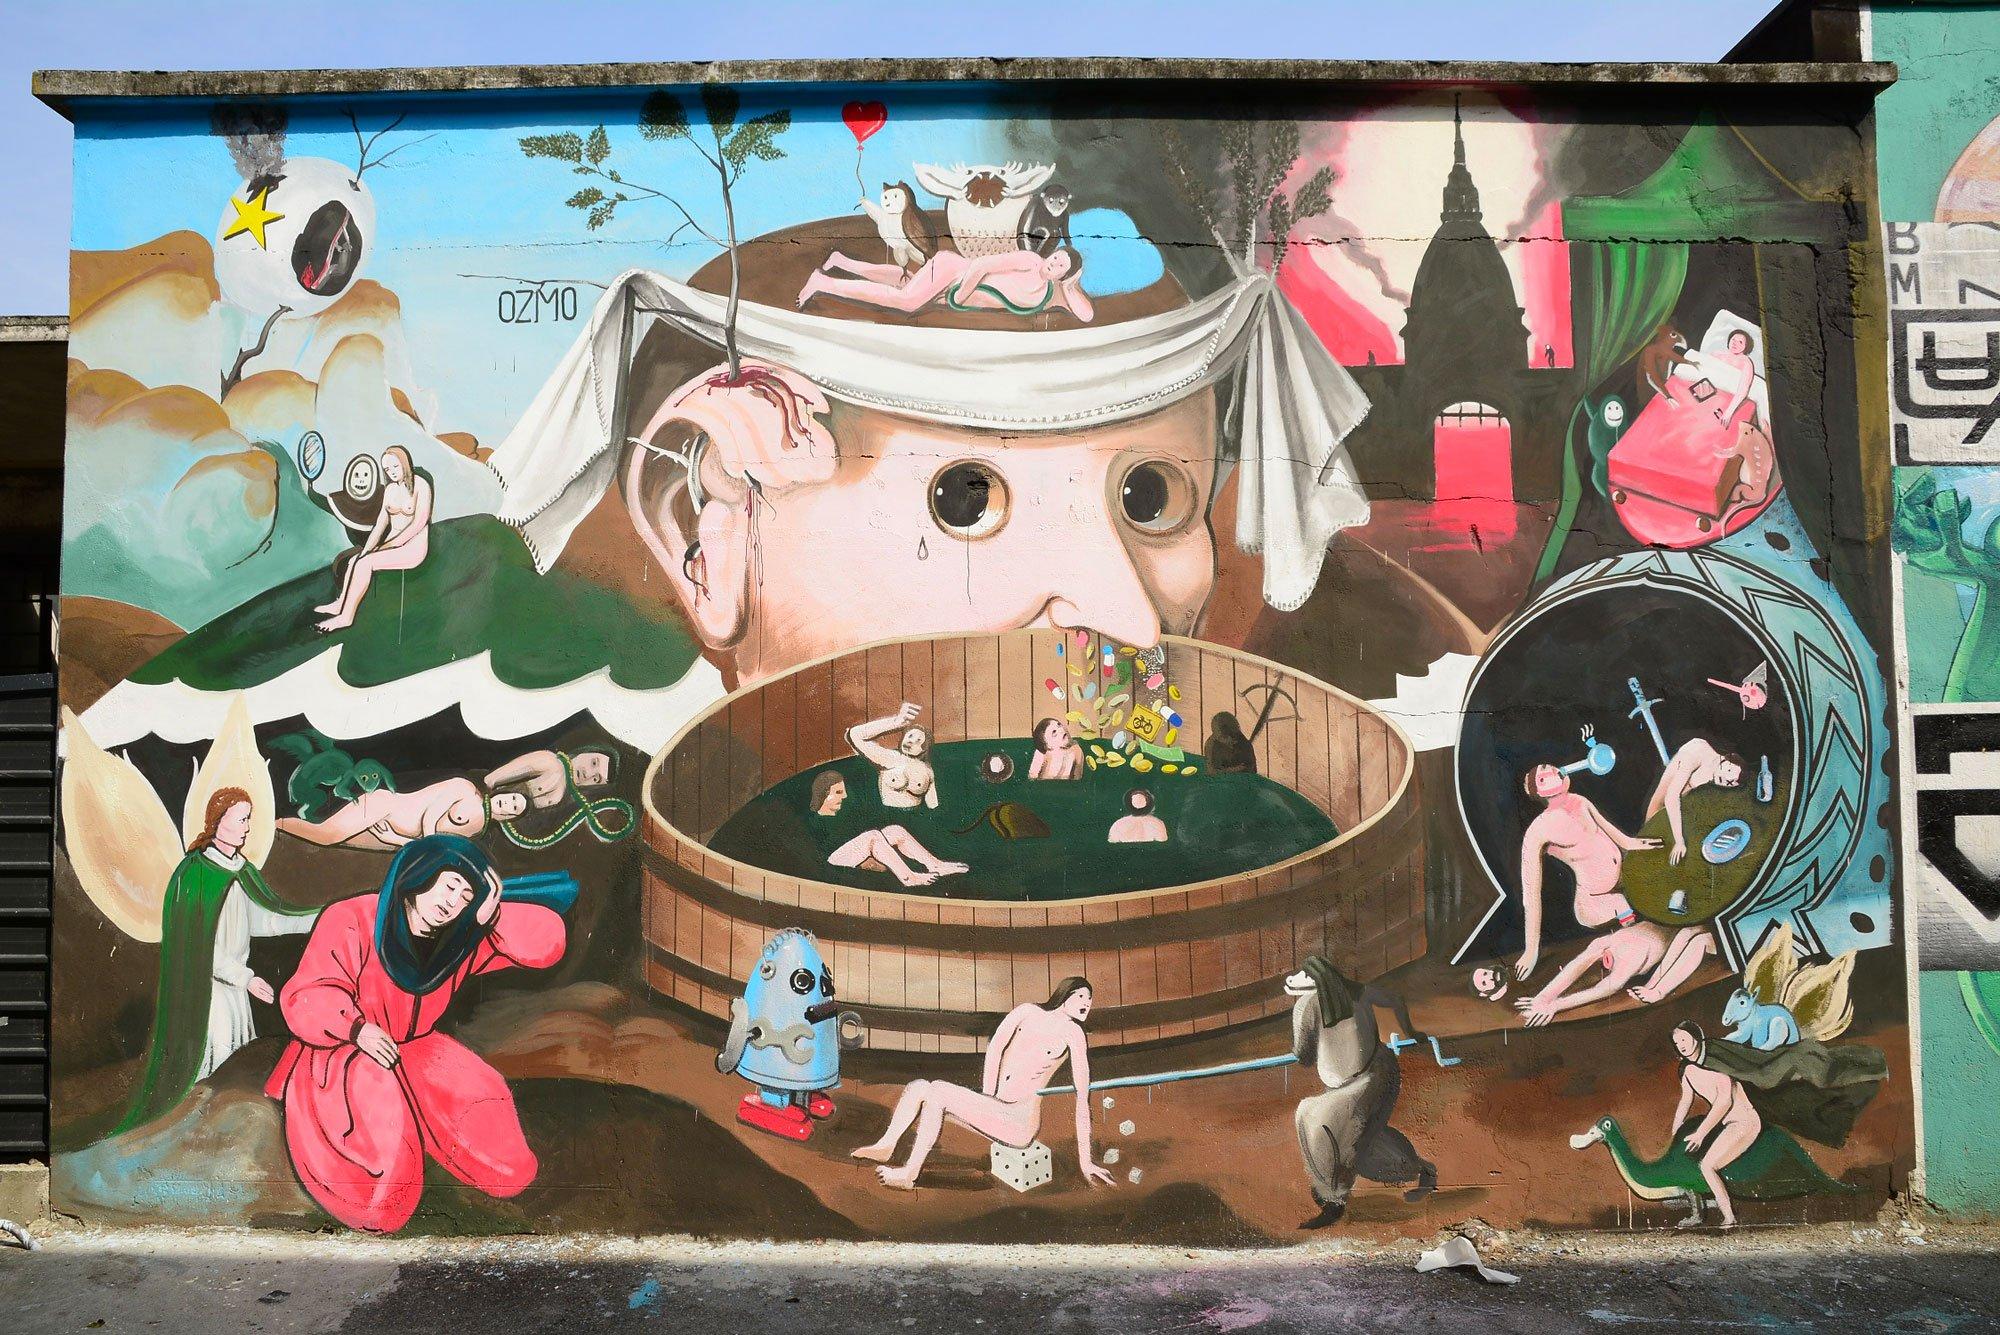 Mural in Turin , inspired by Bosch's school